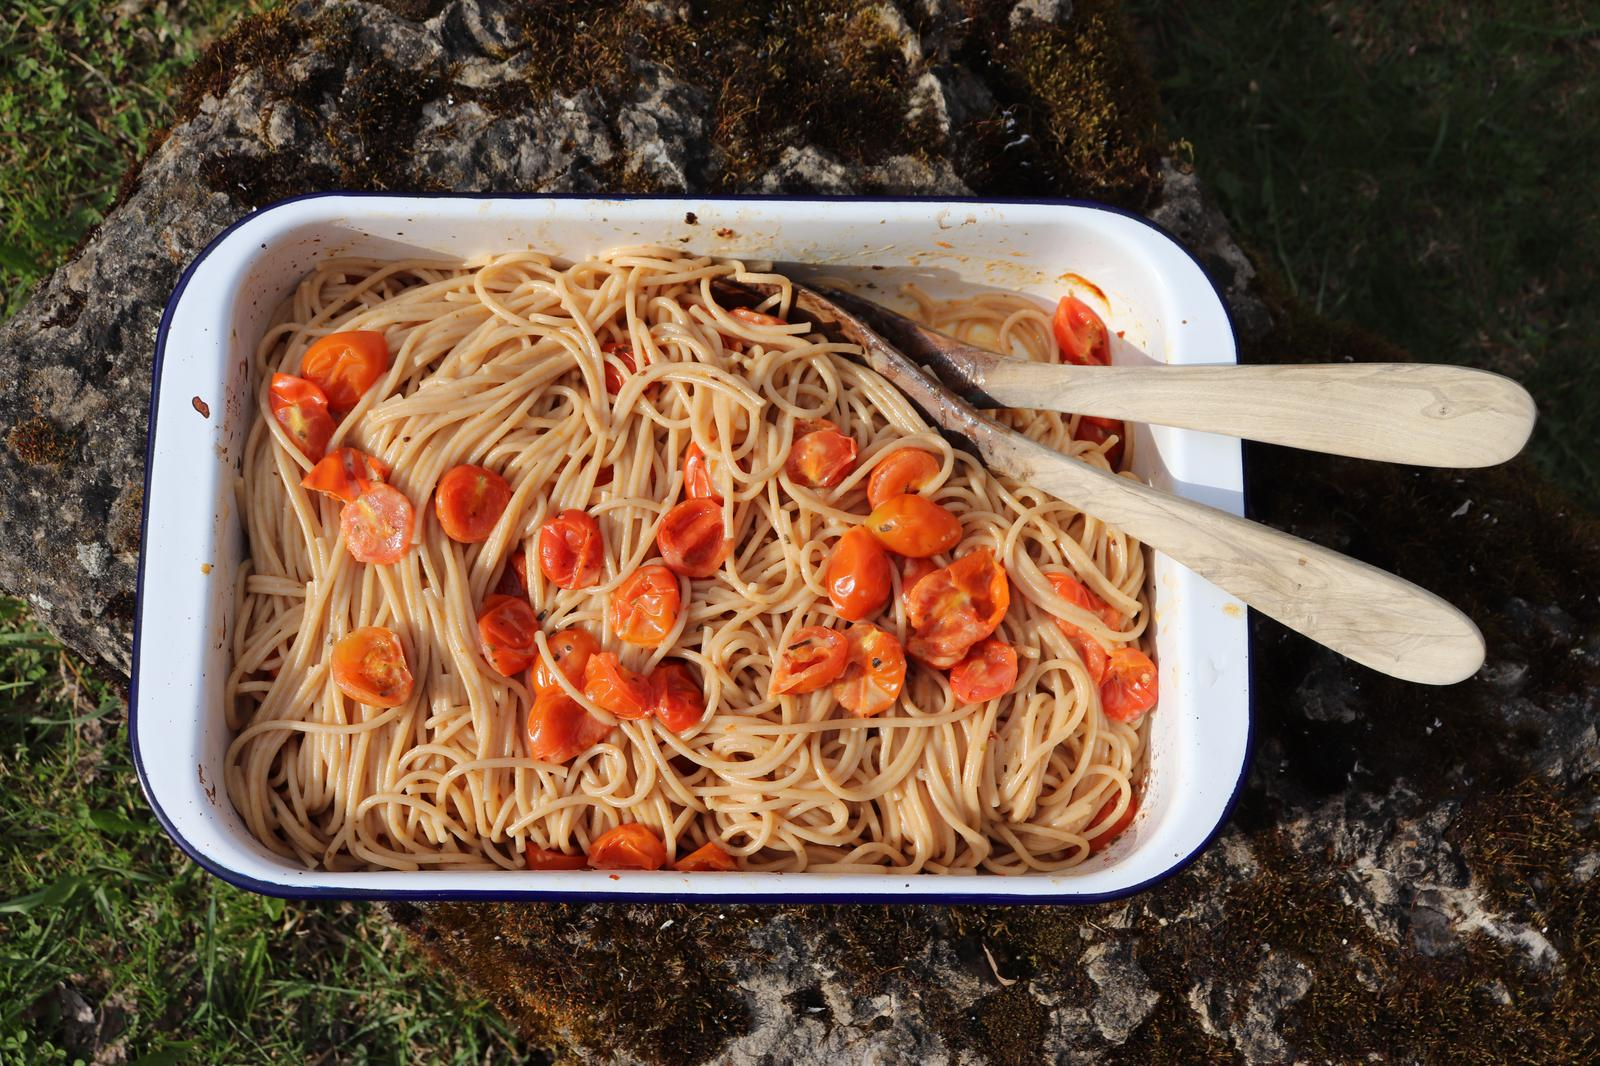 Vegane Feta-Pasta|vegane Feta-Spaghetti|vegan|vegane TikTok-Pasta|TikTok-Spaghetti|vegan und vollwertig|vollwertig und vegan|vegane Familienküche|vegane Familienrezepte|vollwertig|Vollkornspaghetti